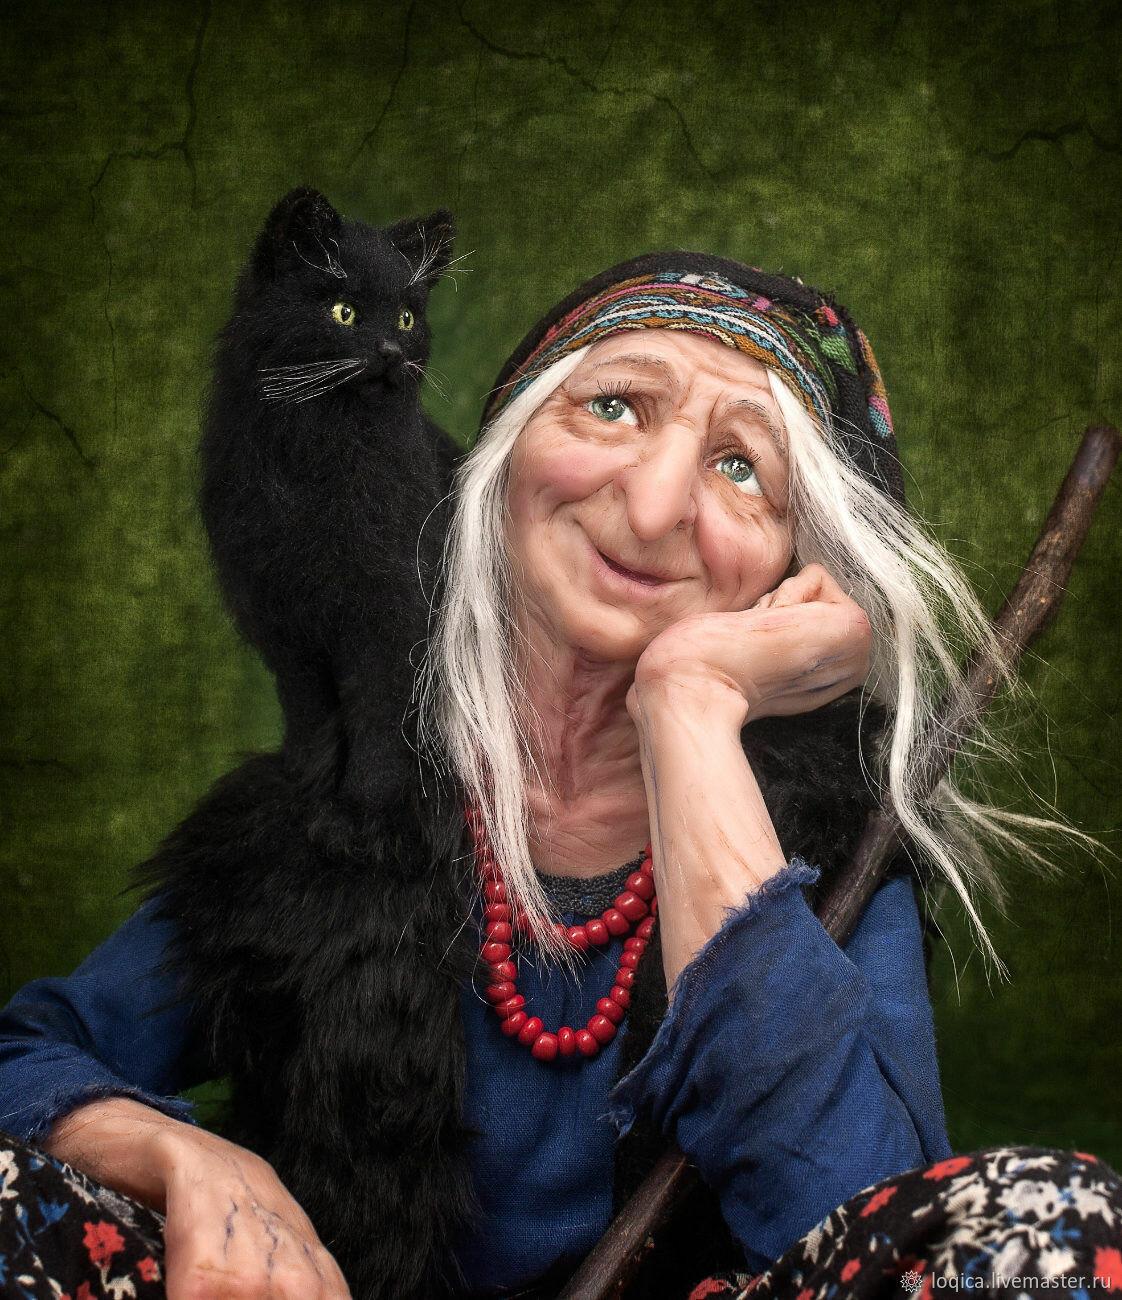 Картинки баба в игре не баба